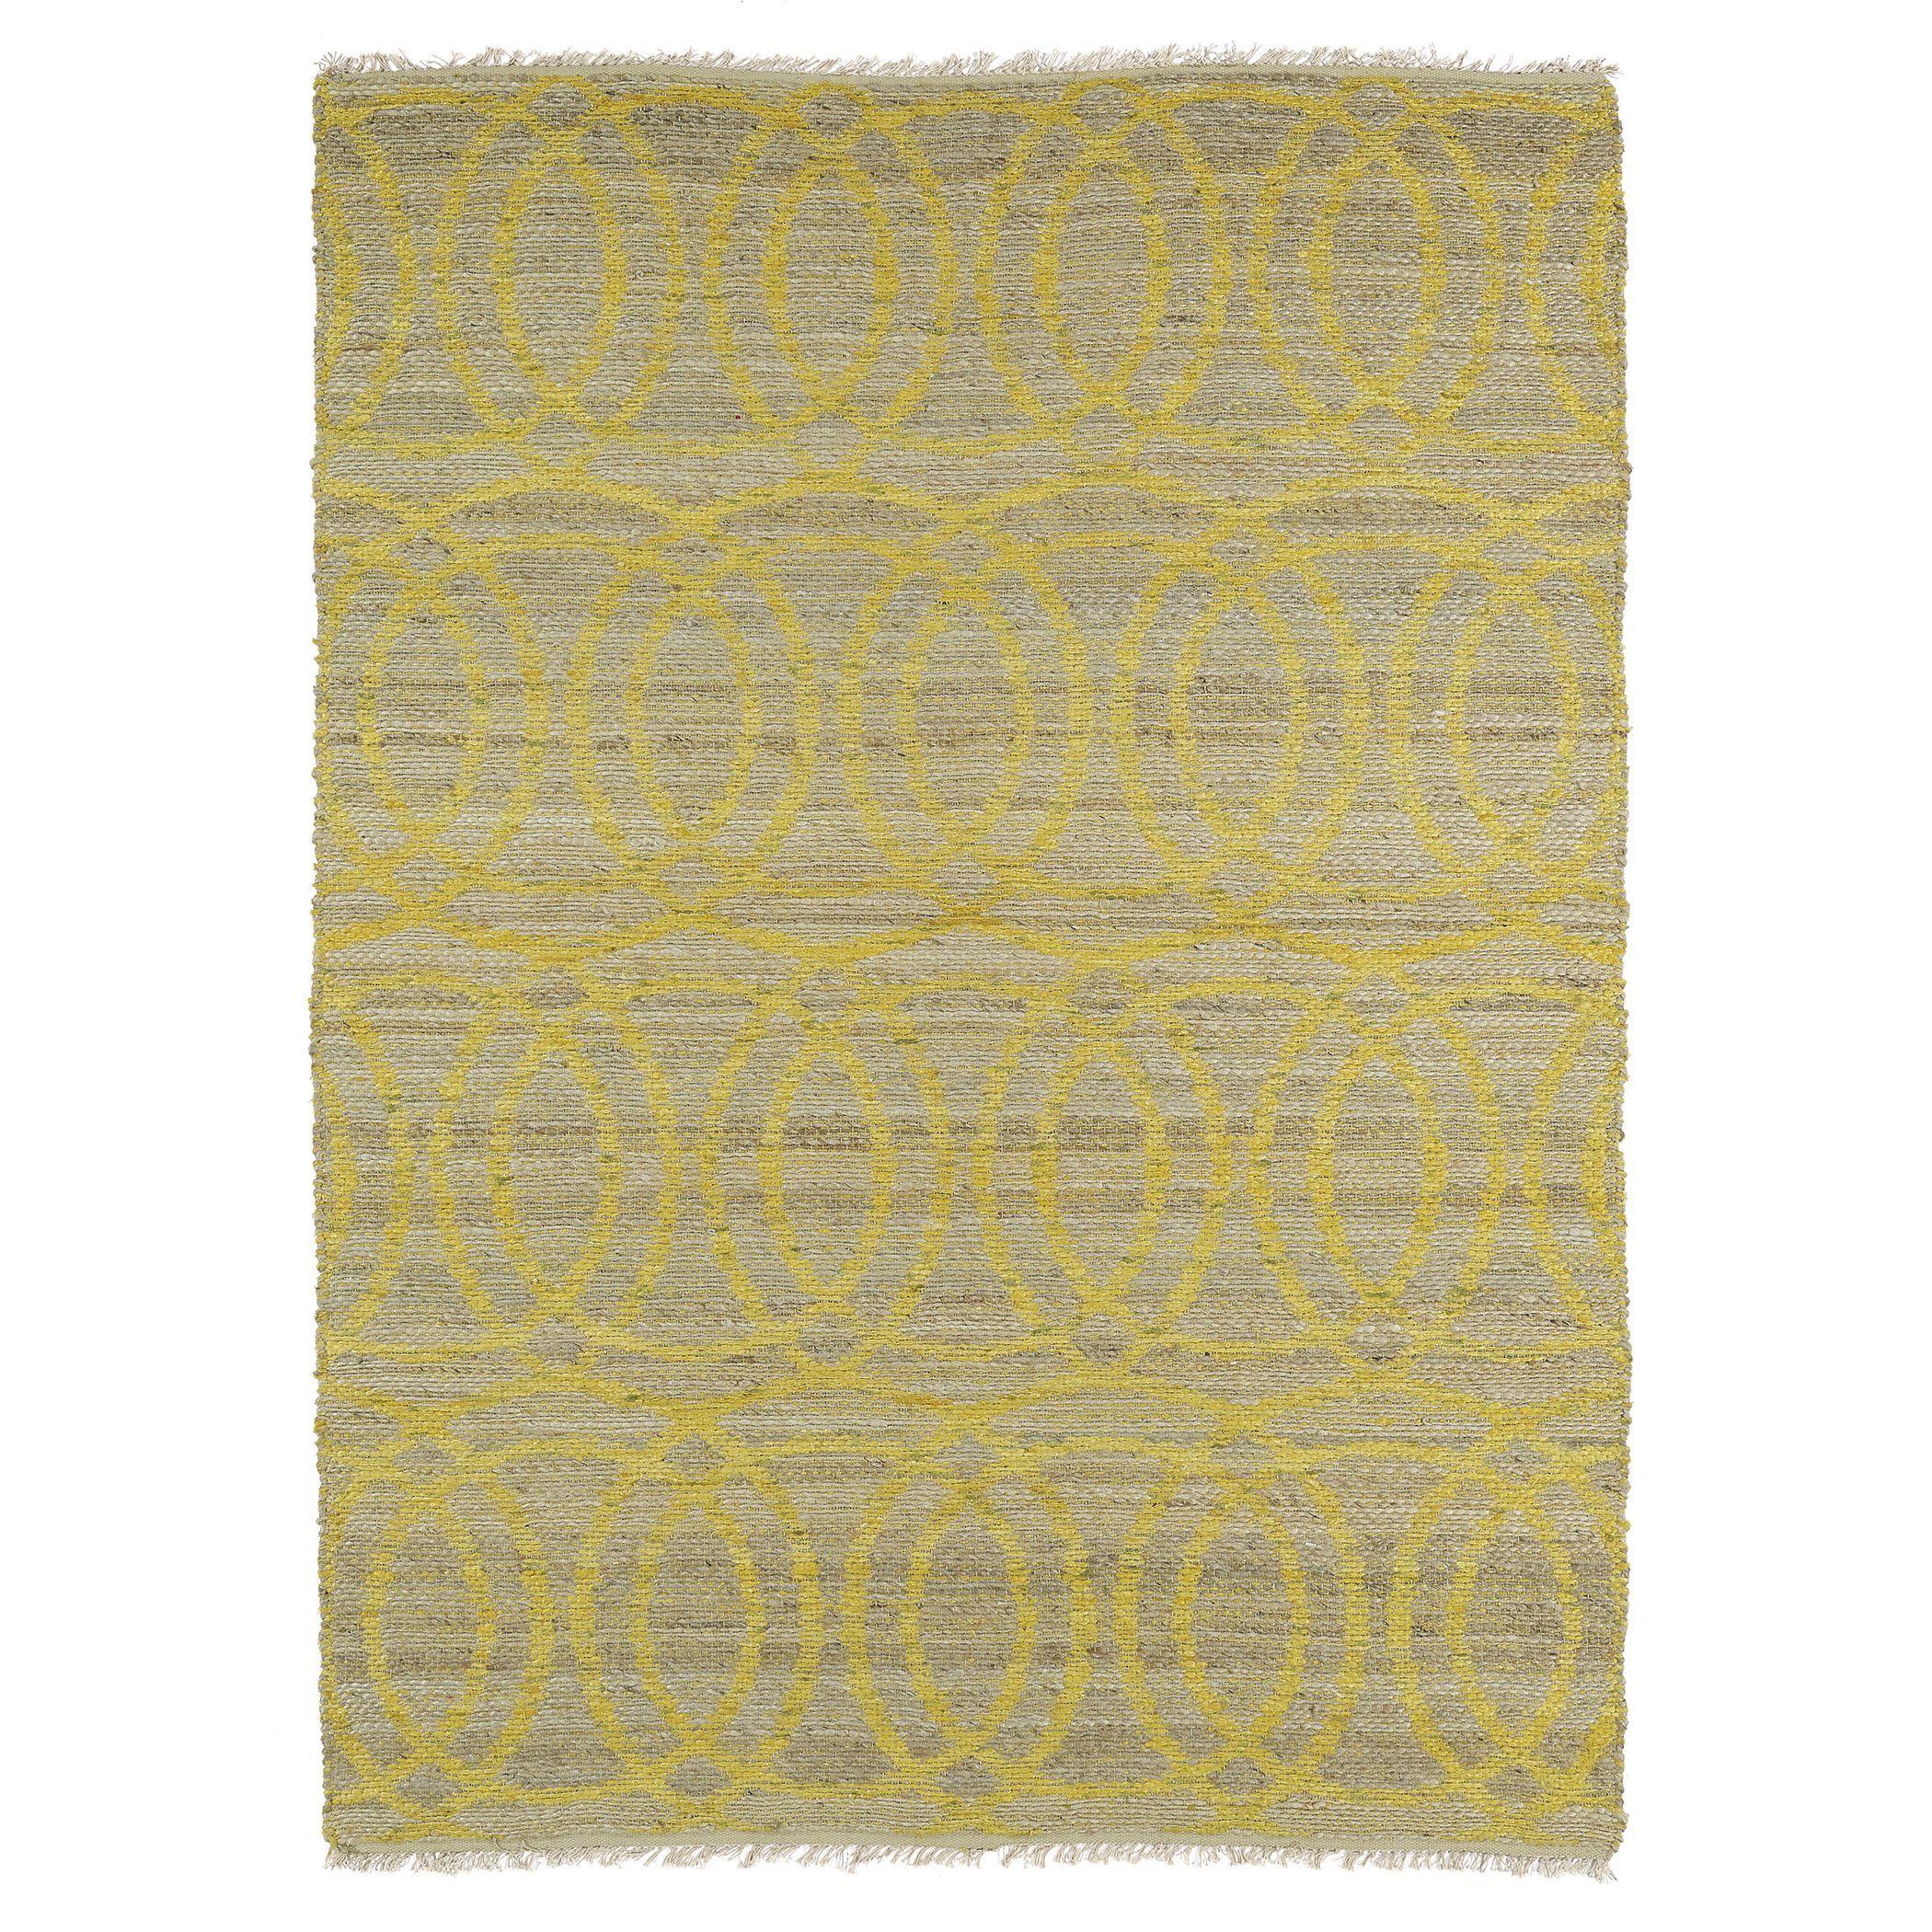 Kaleen Rugs Handmade Natural Fiber Cayon Yellow Circles Rug (5'0 x 7'9) (5'0 x 7'9), Size 5' x 7' (Jute, Geometric)